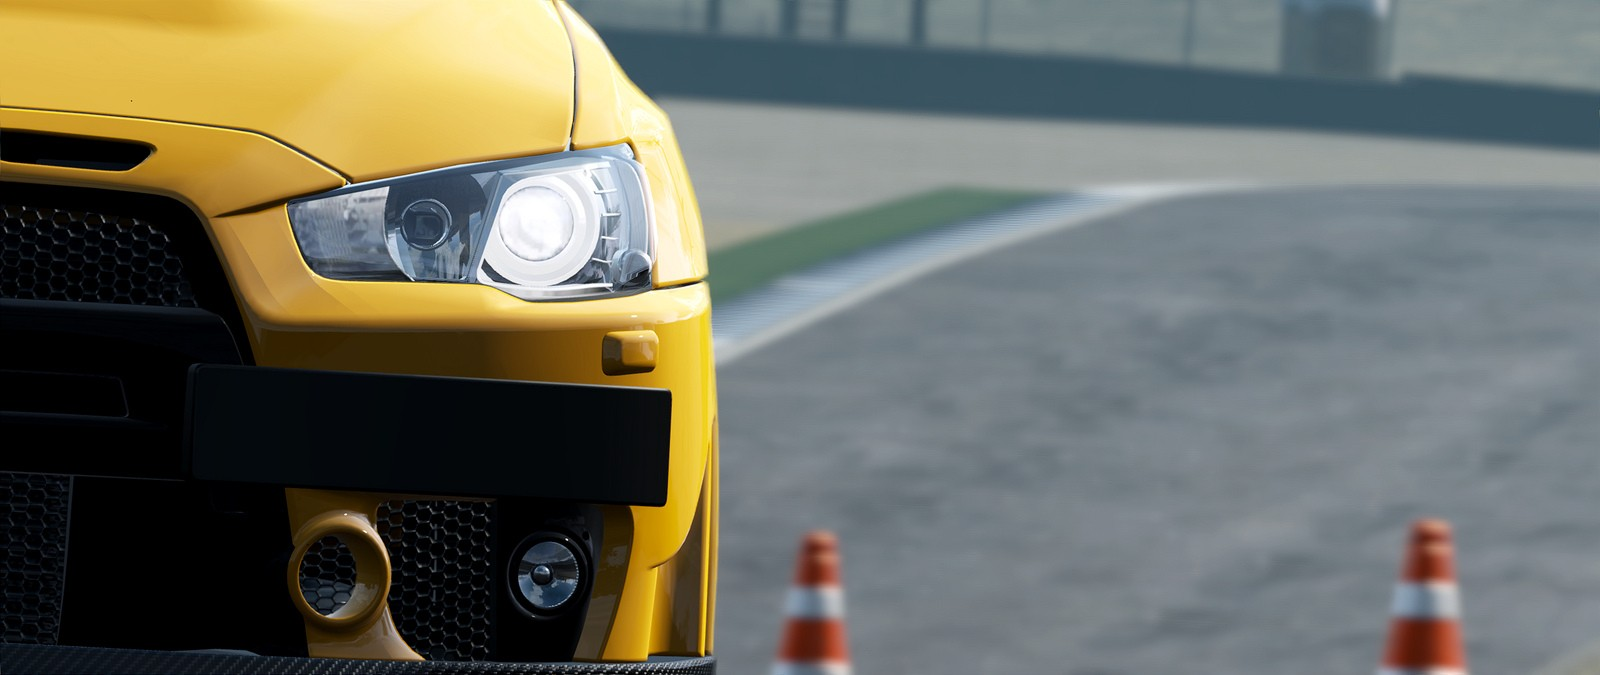 0032 تصاویر جدید Project Cars منتشر شد